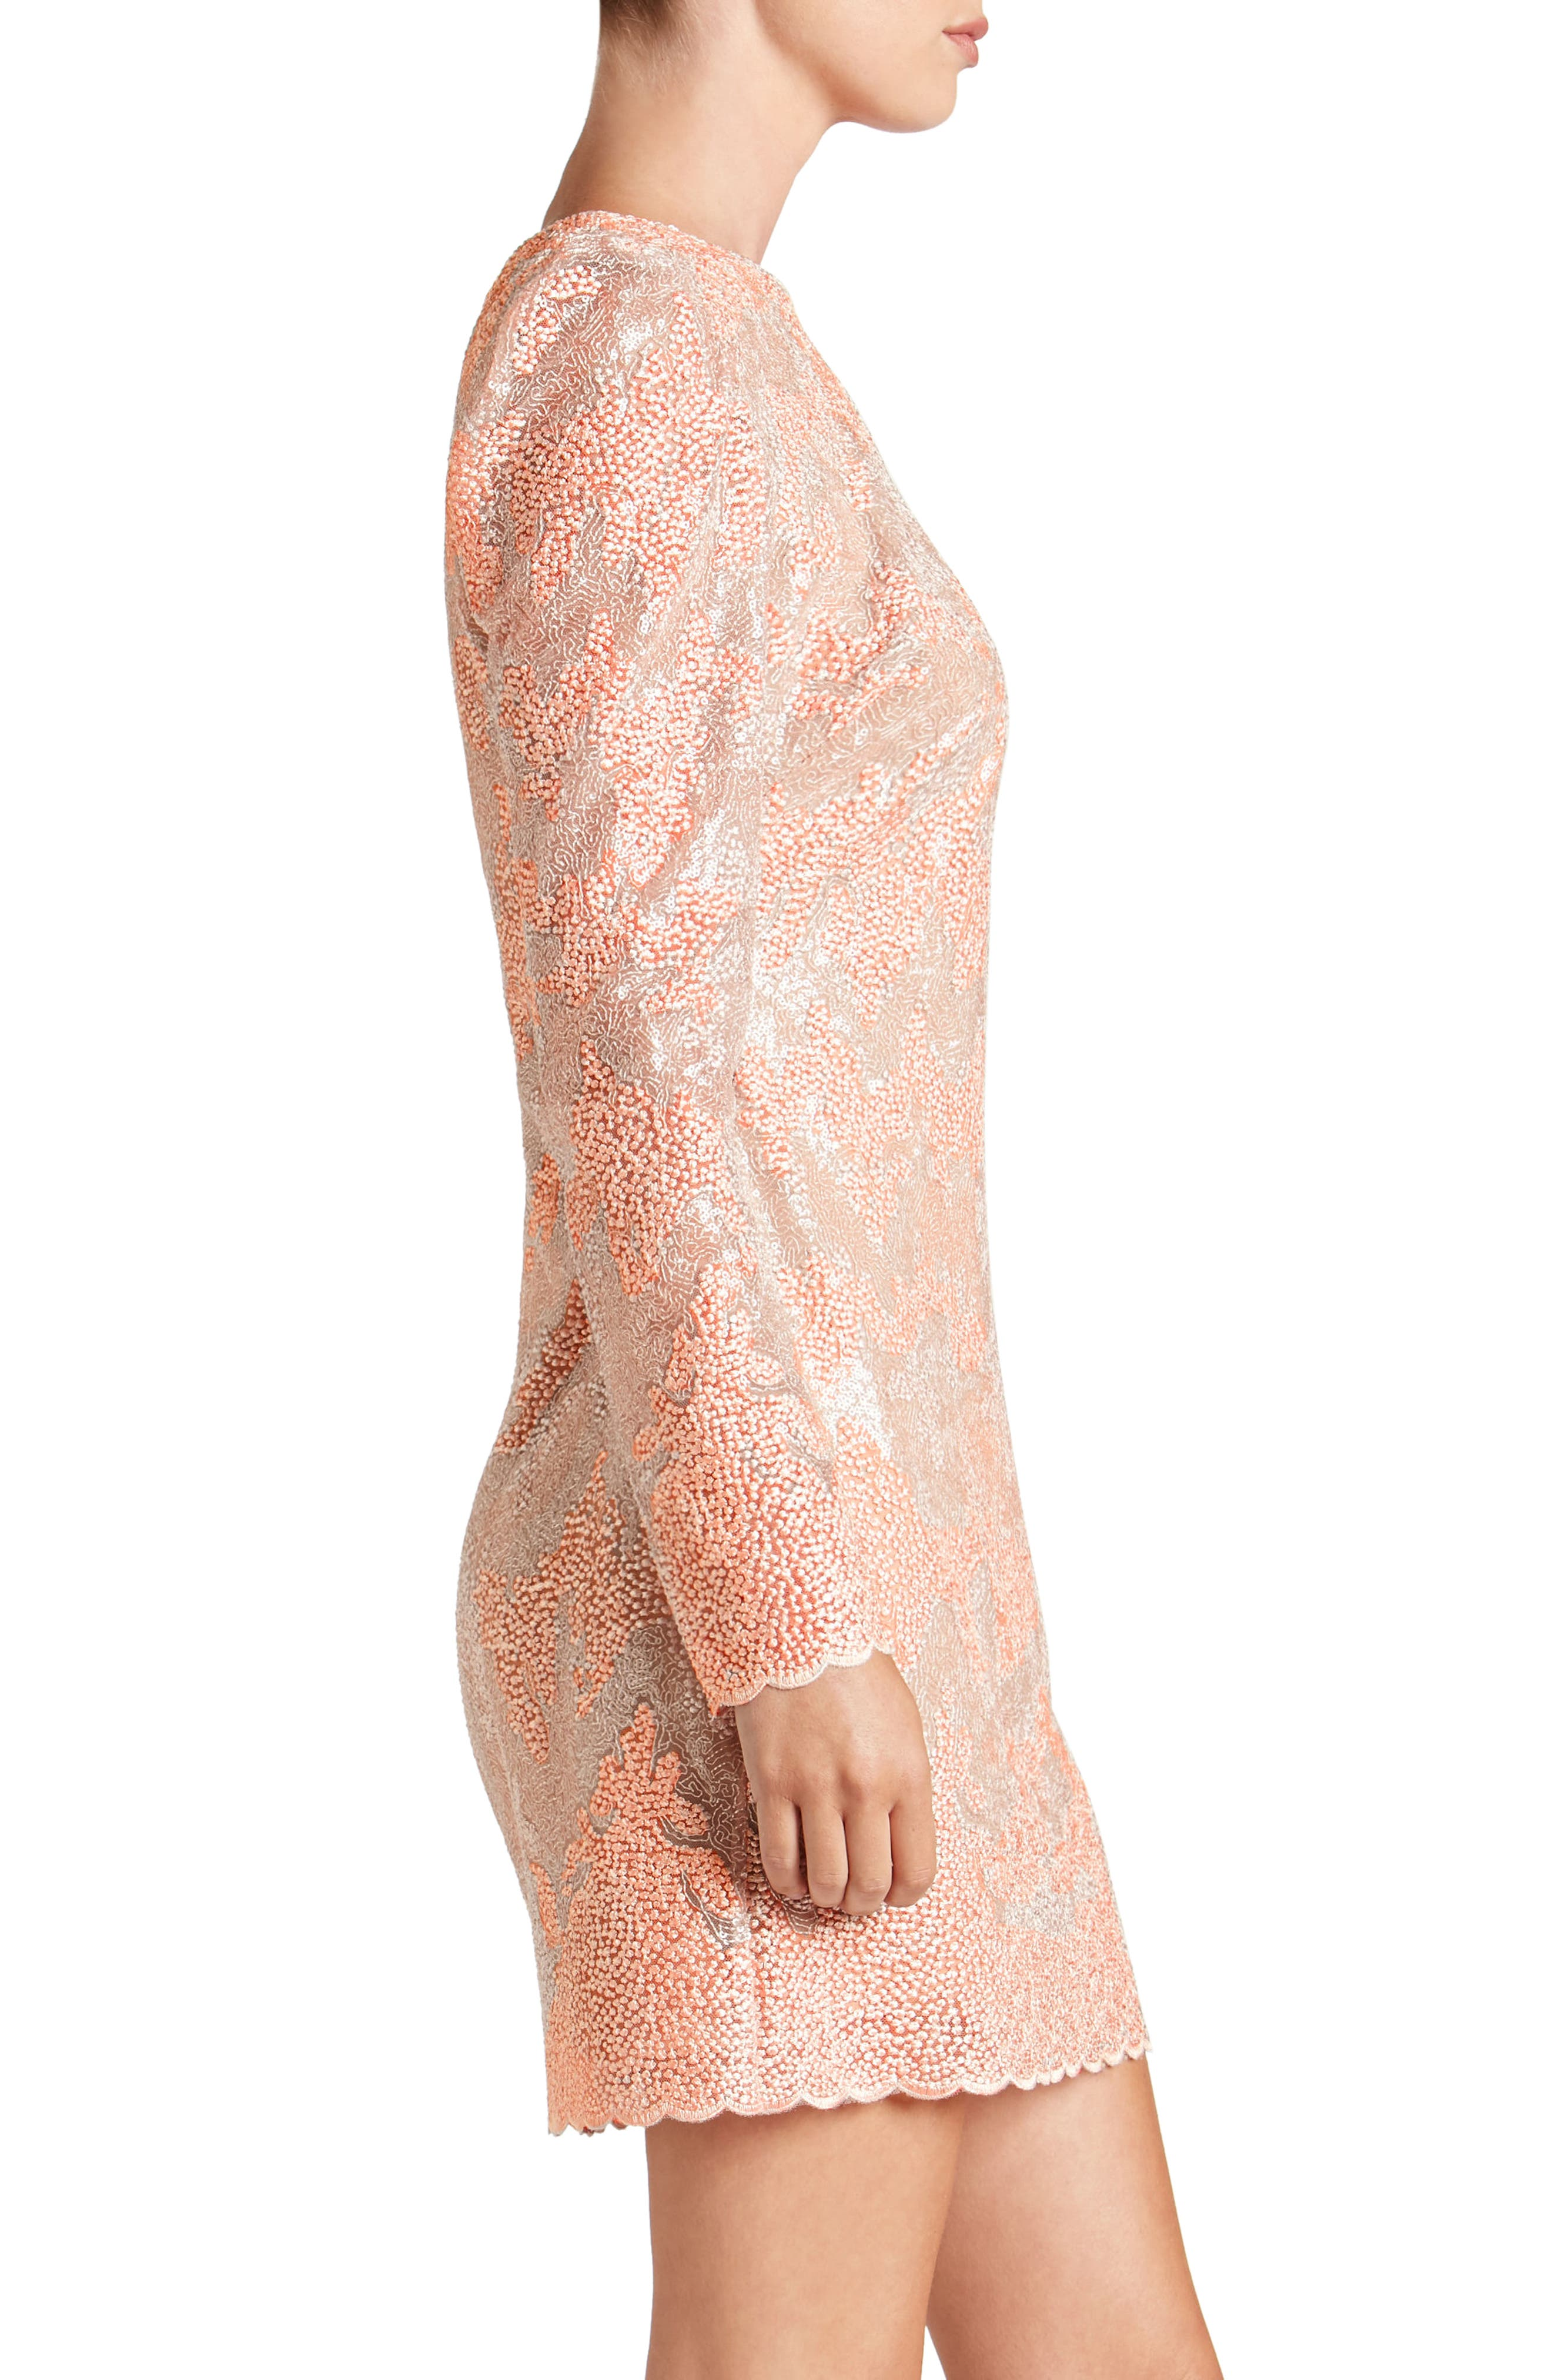 Aubry Sequin Embellished Shift Dress,                             Alternate thumbnail 3, color,                             686